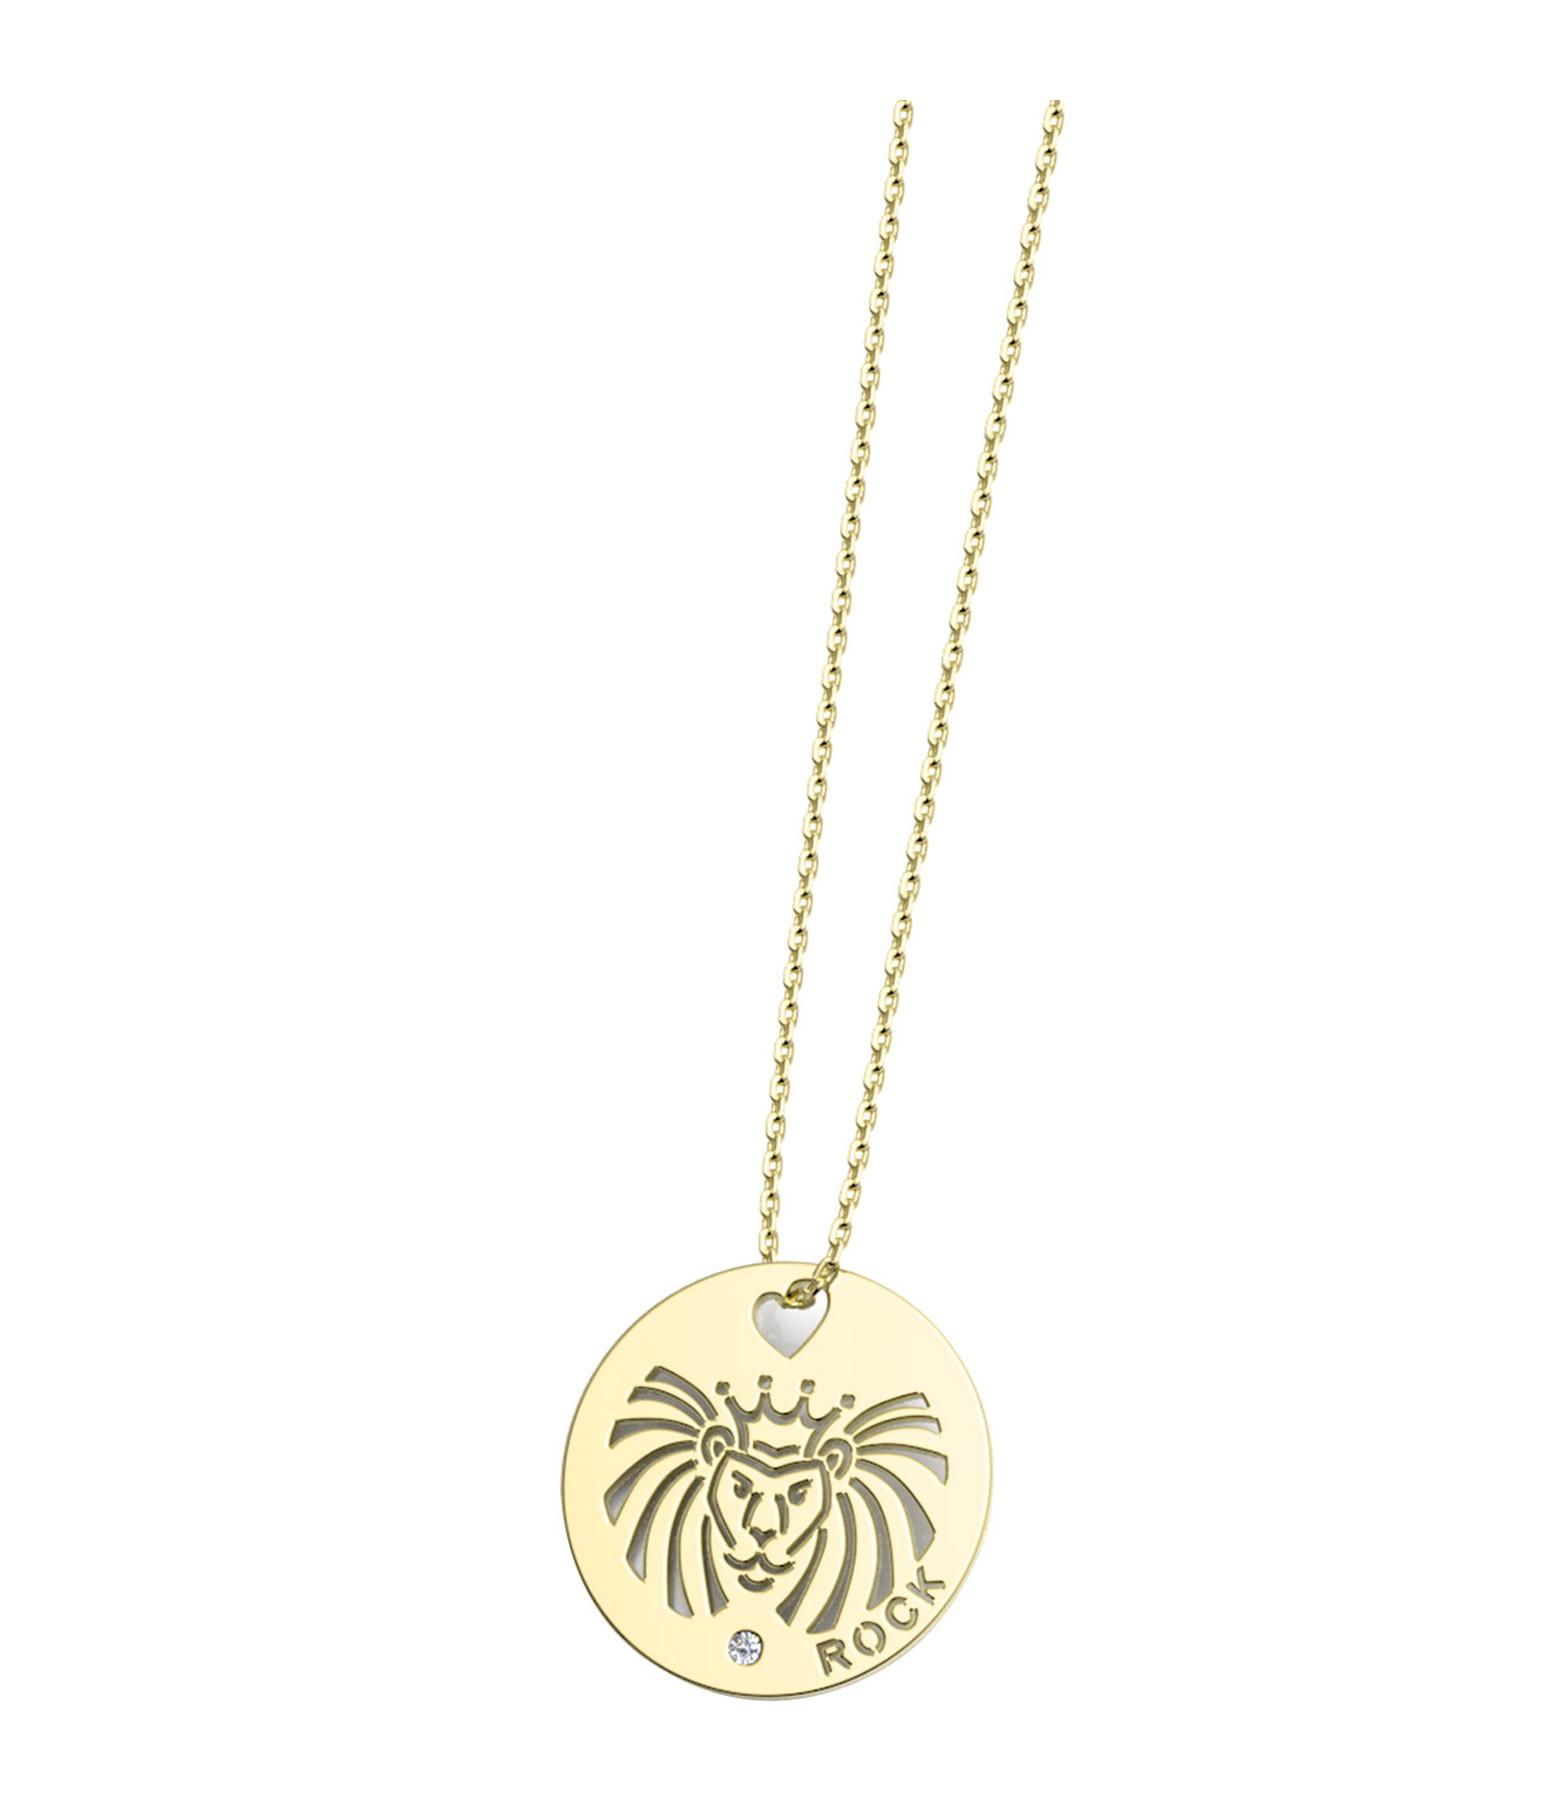 NAVA JOAILLERIE - Collier Horosco-Rock Lion Diamants Or